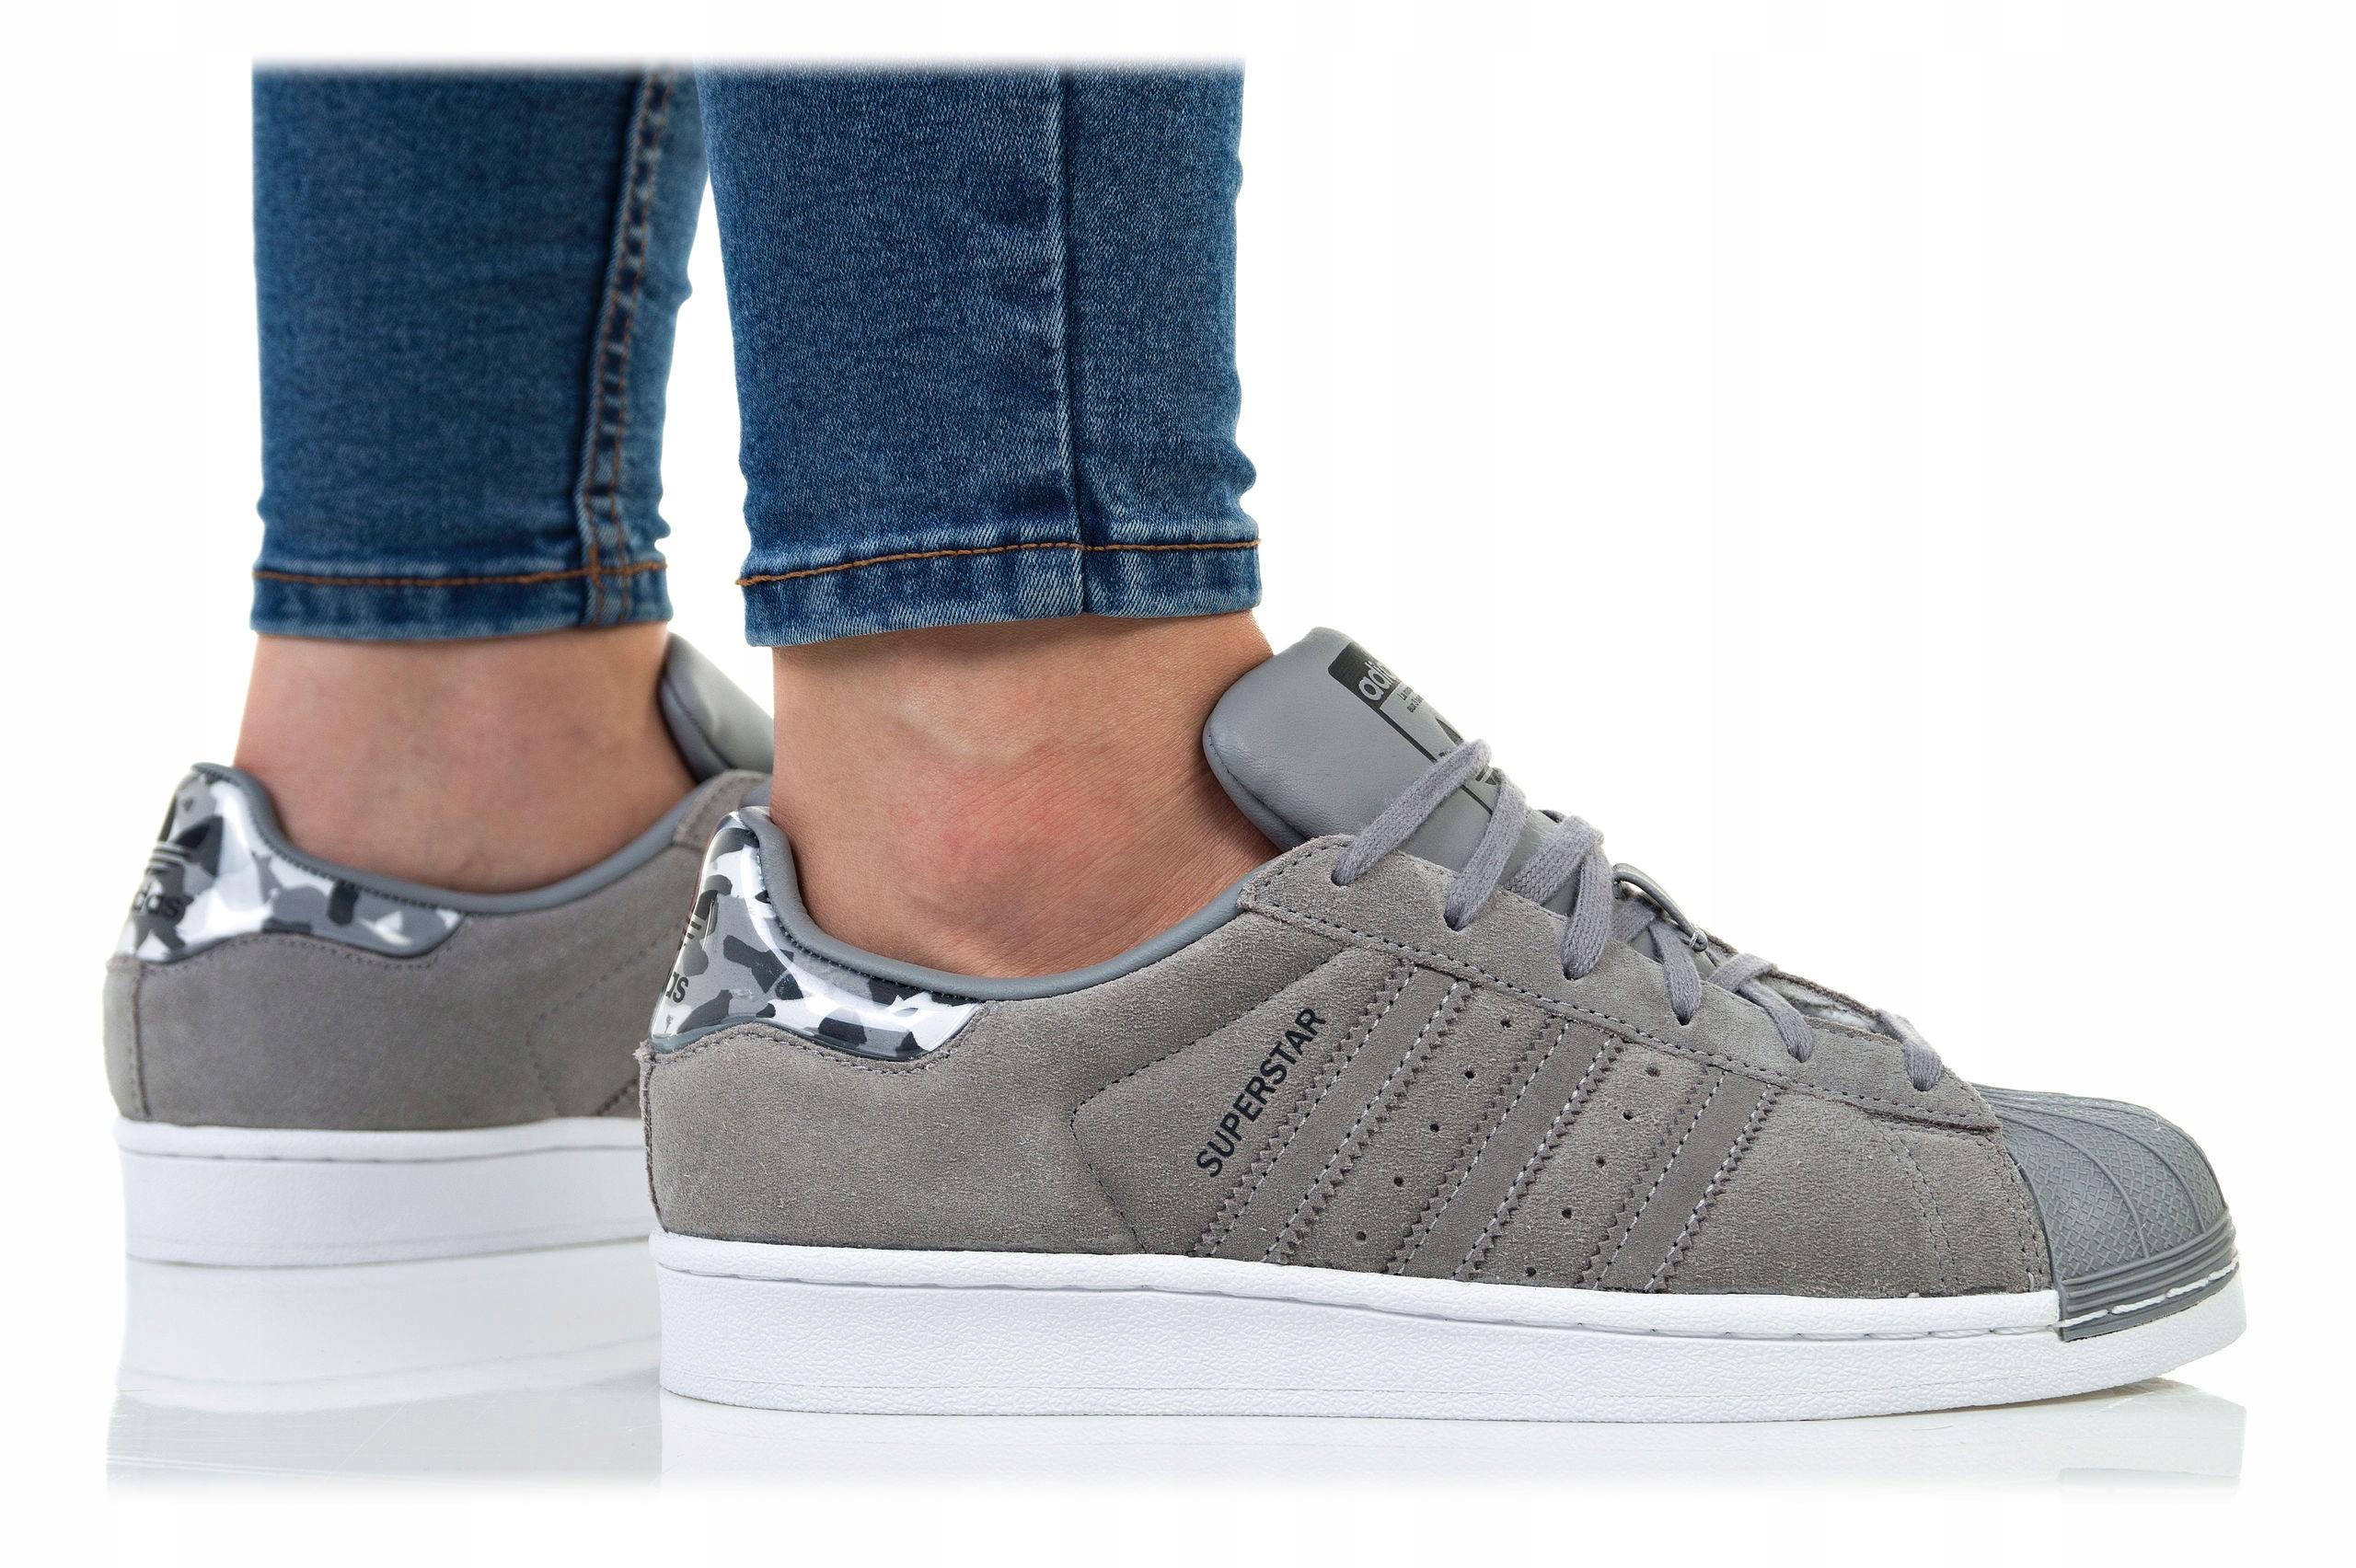 adidas Originals Buty Superstar Buty męskie szare w